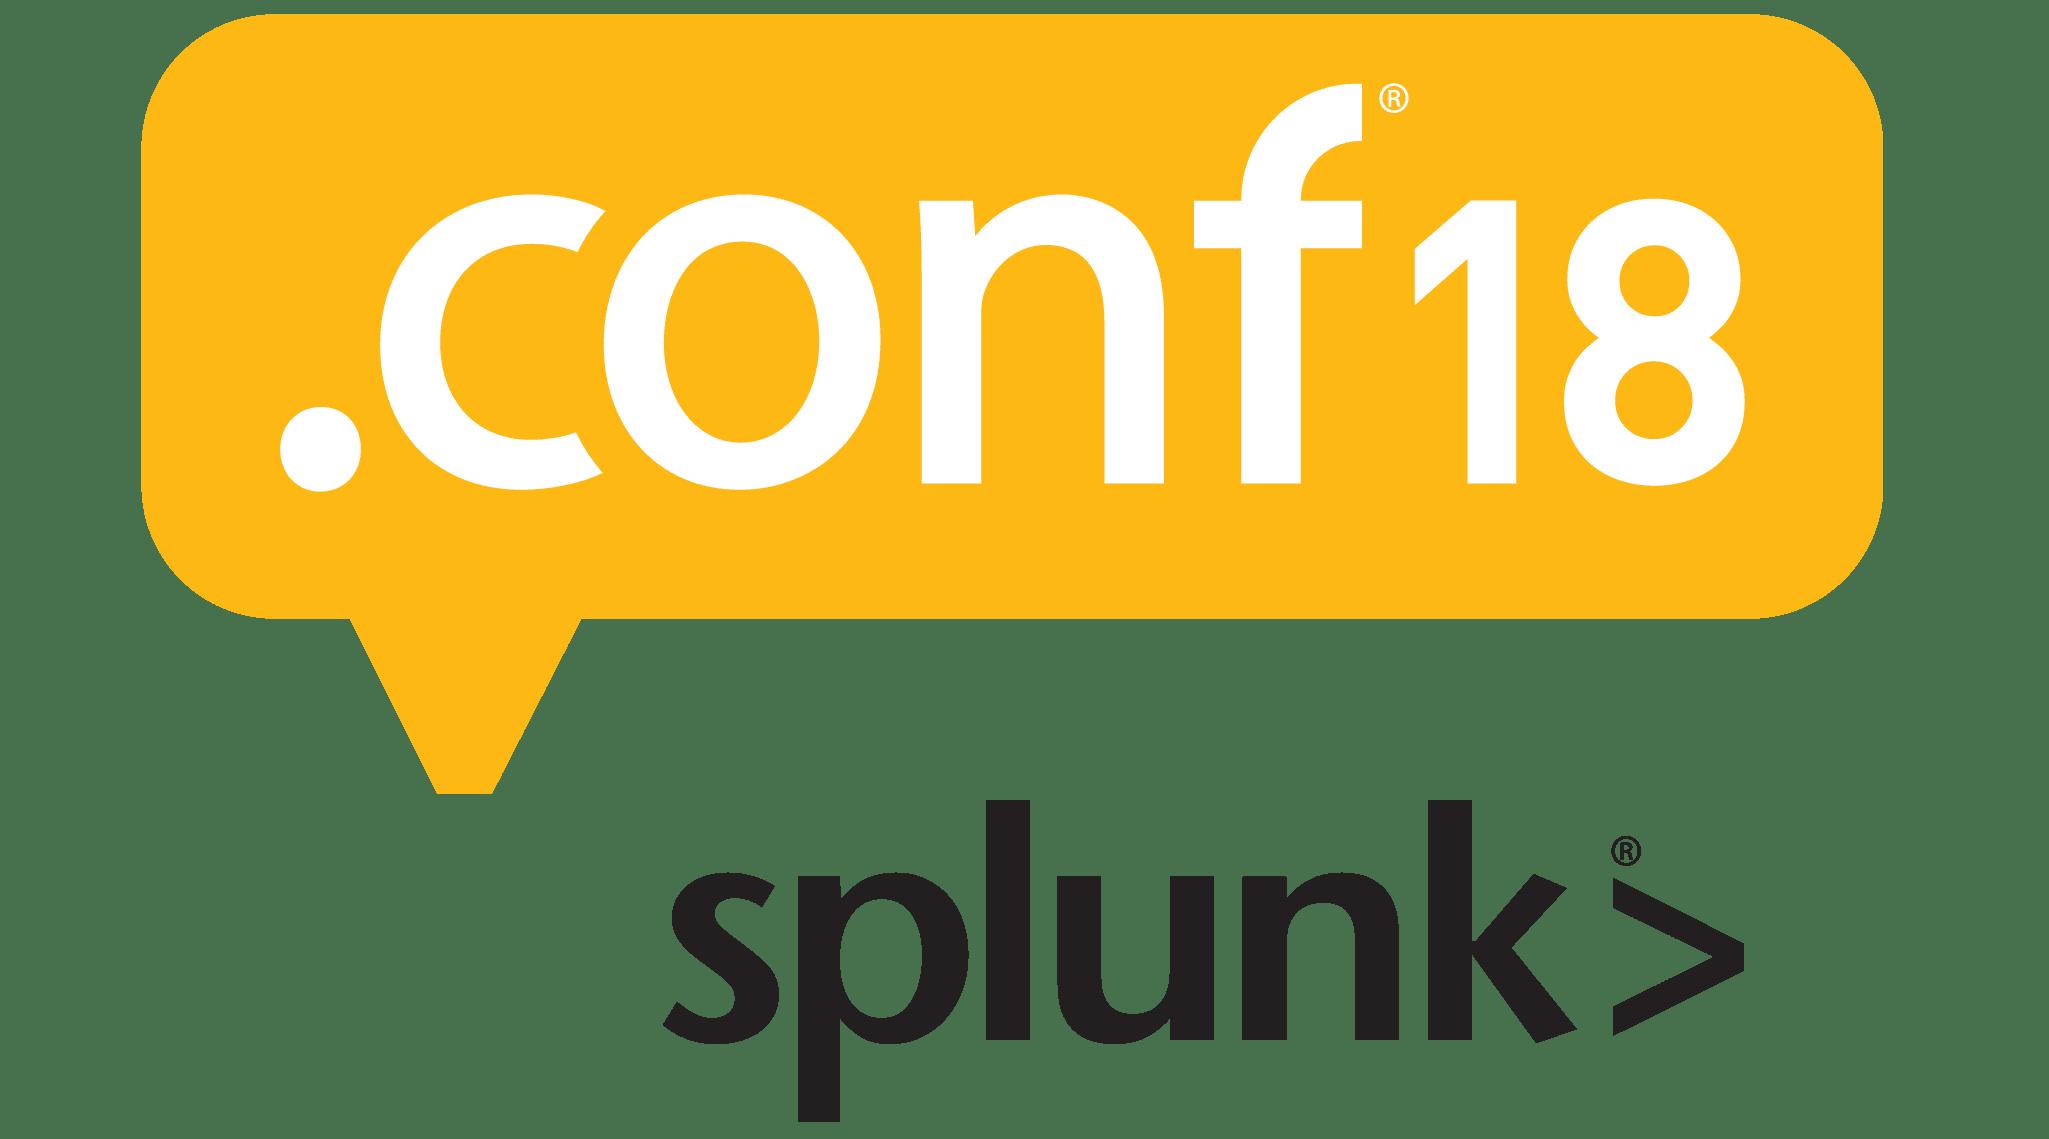 Palo Alto Networks Crunchbase